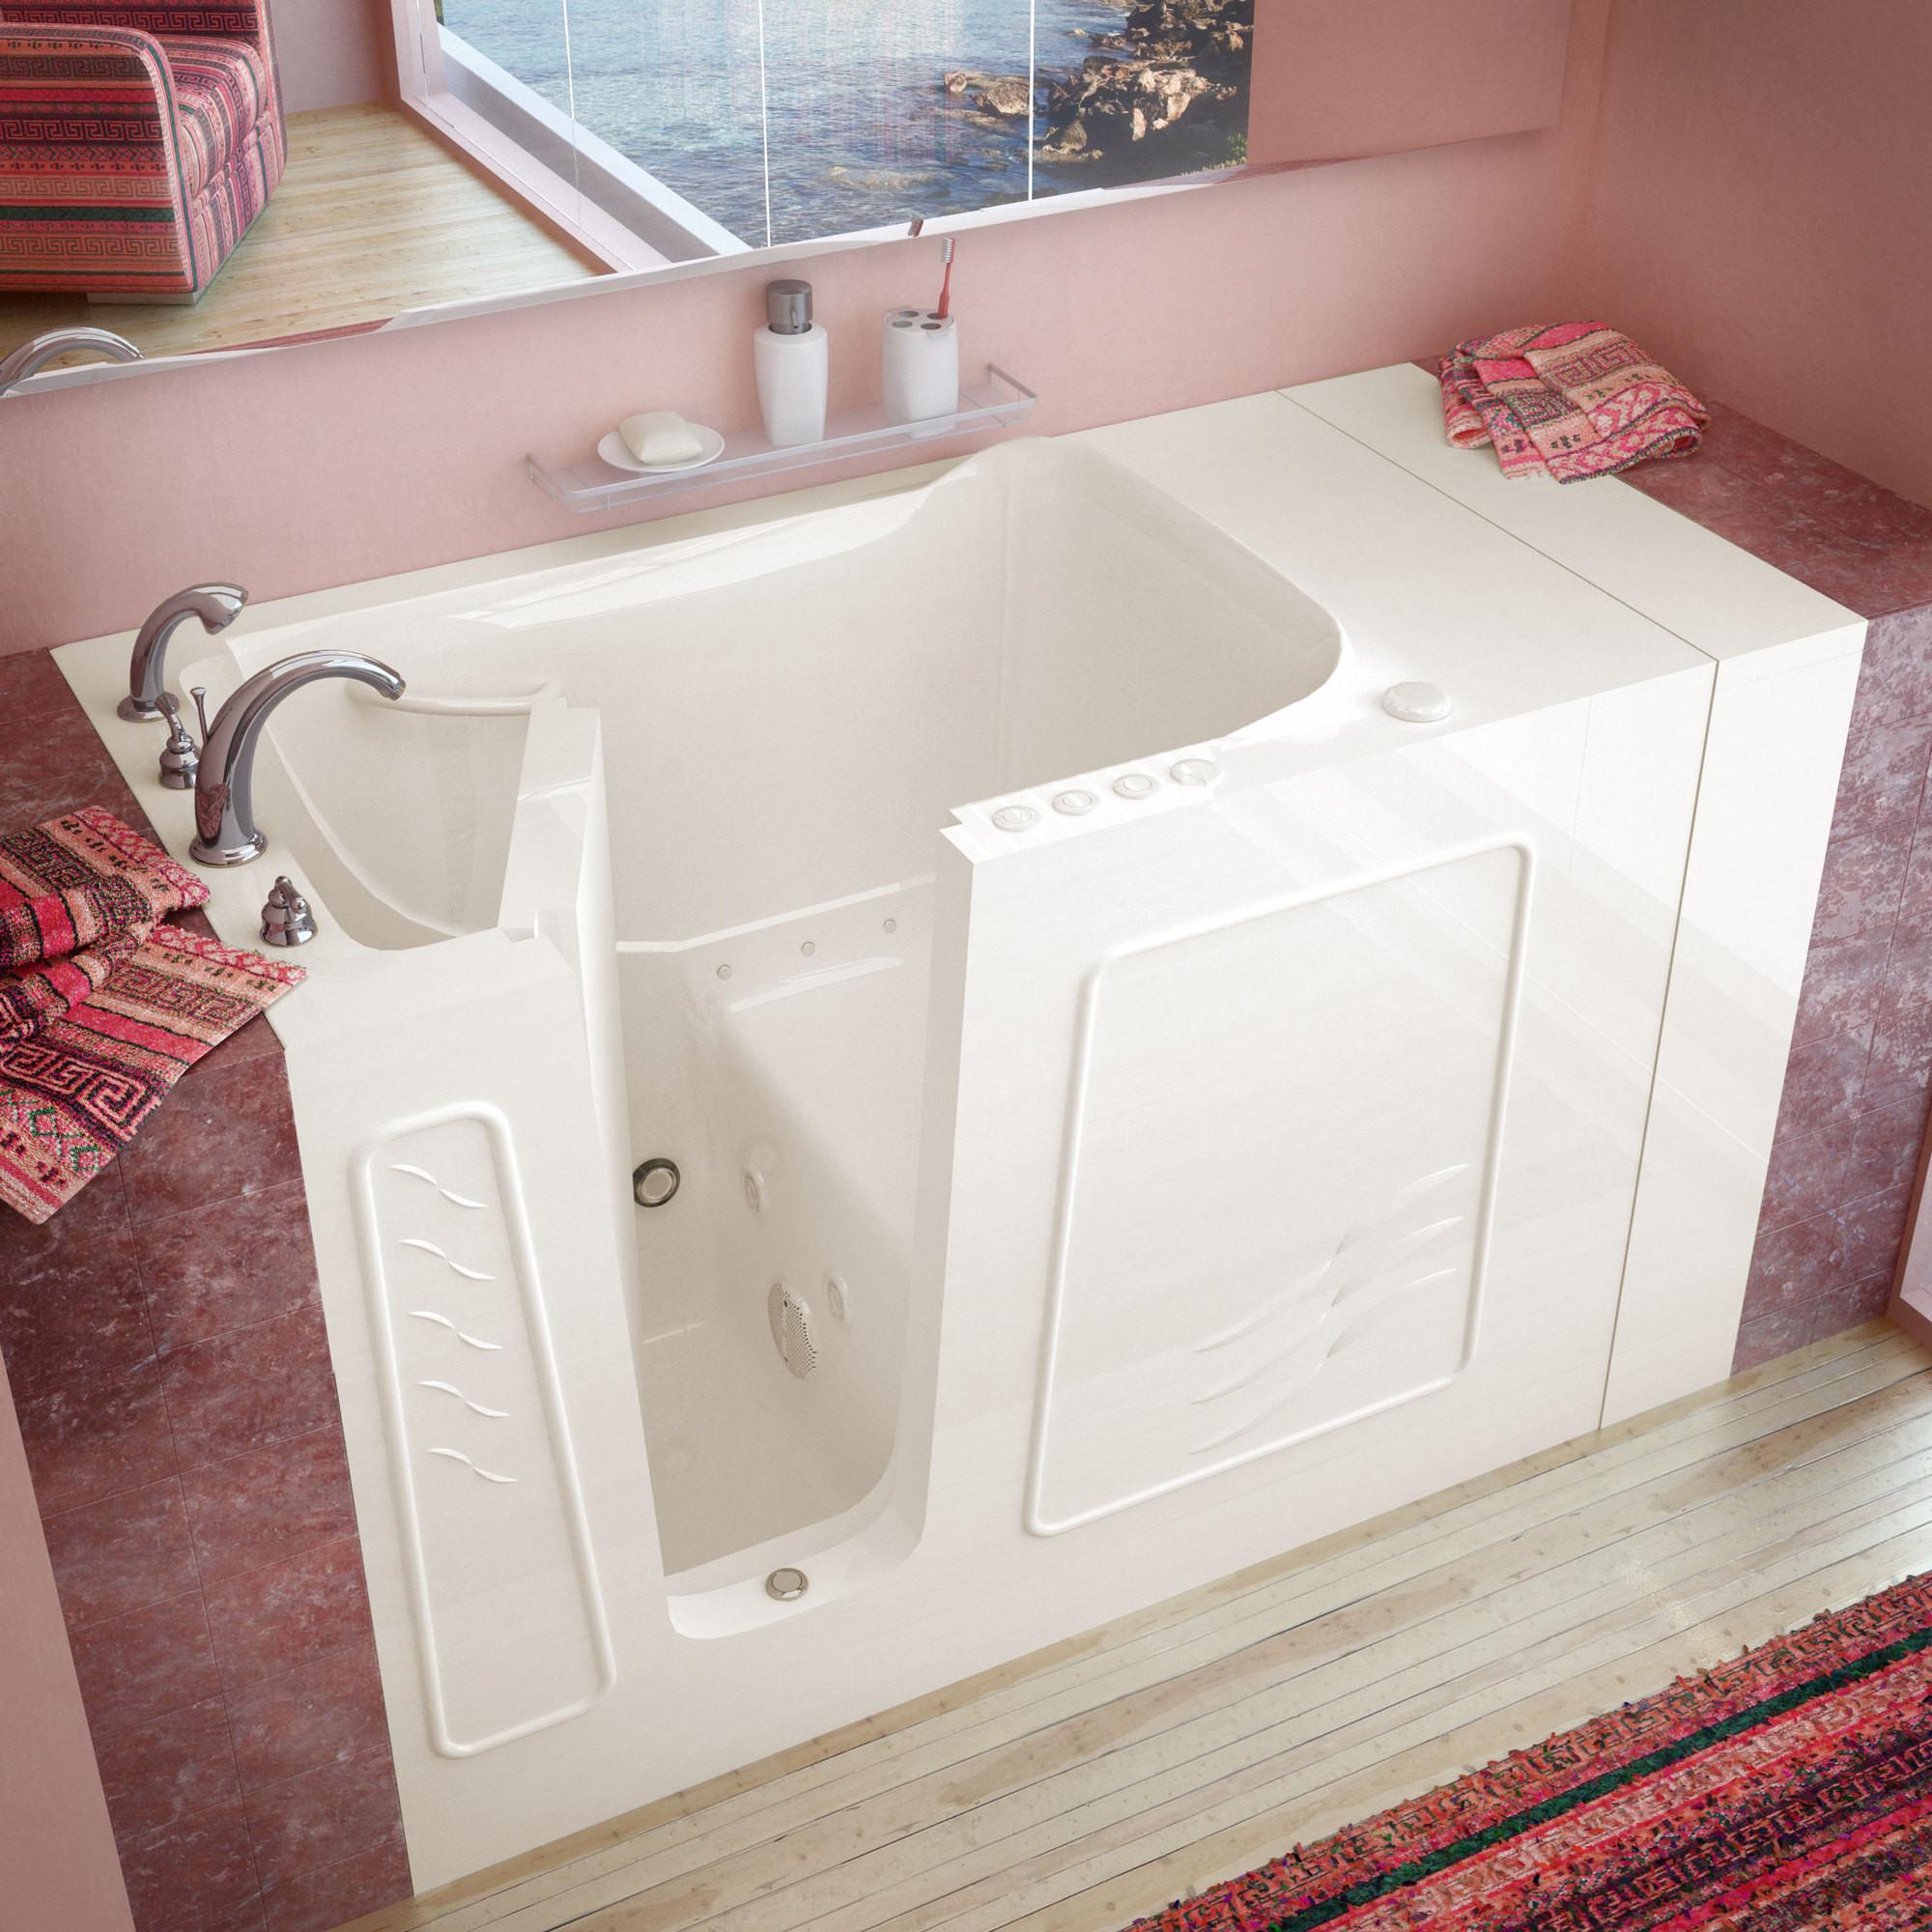 MediTub 3053LBD Walk-In 30 x 53 Inch Biscuit Whirlpool & Air Jetted Bathtub